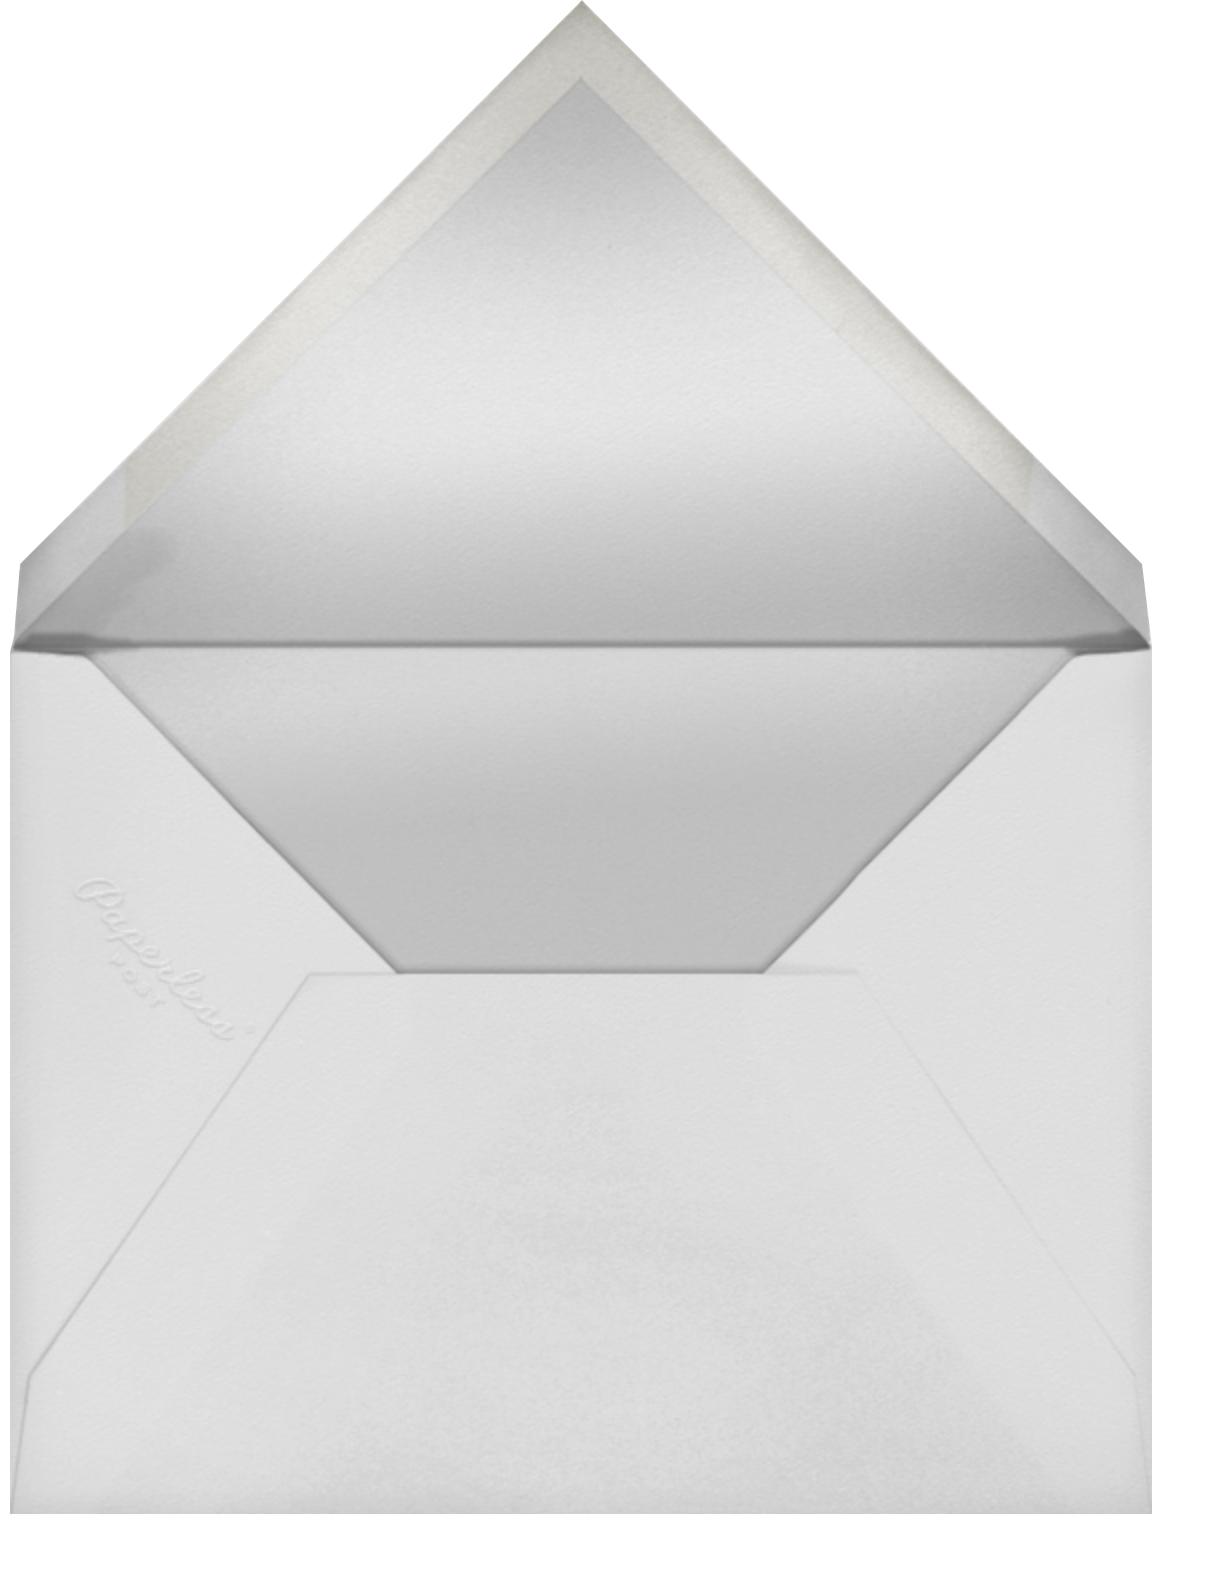 Wood Grain Photo (Tall) - Dark - Paperless Post - null - envelope back